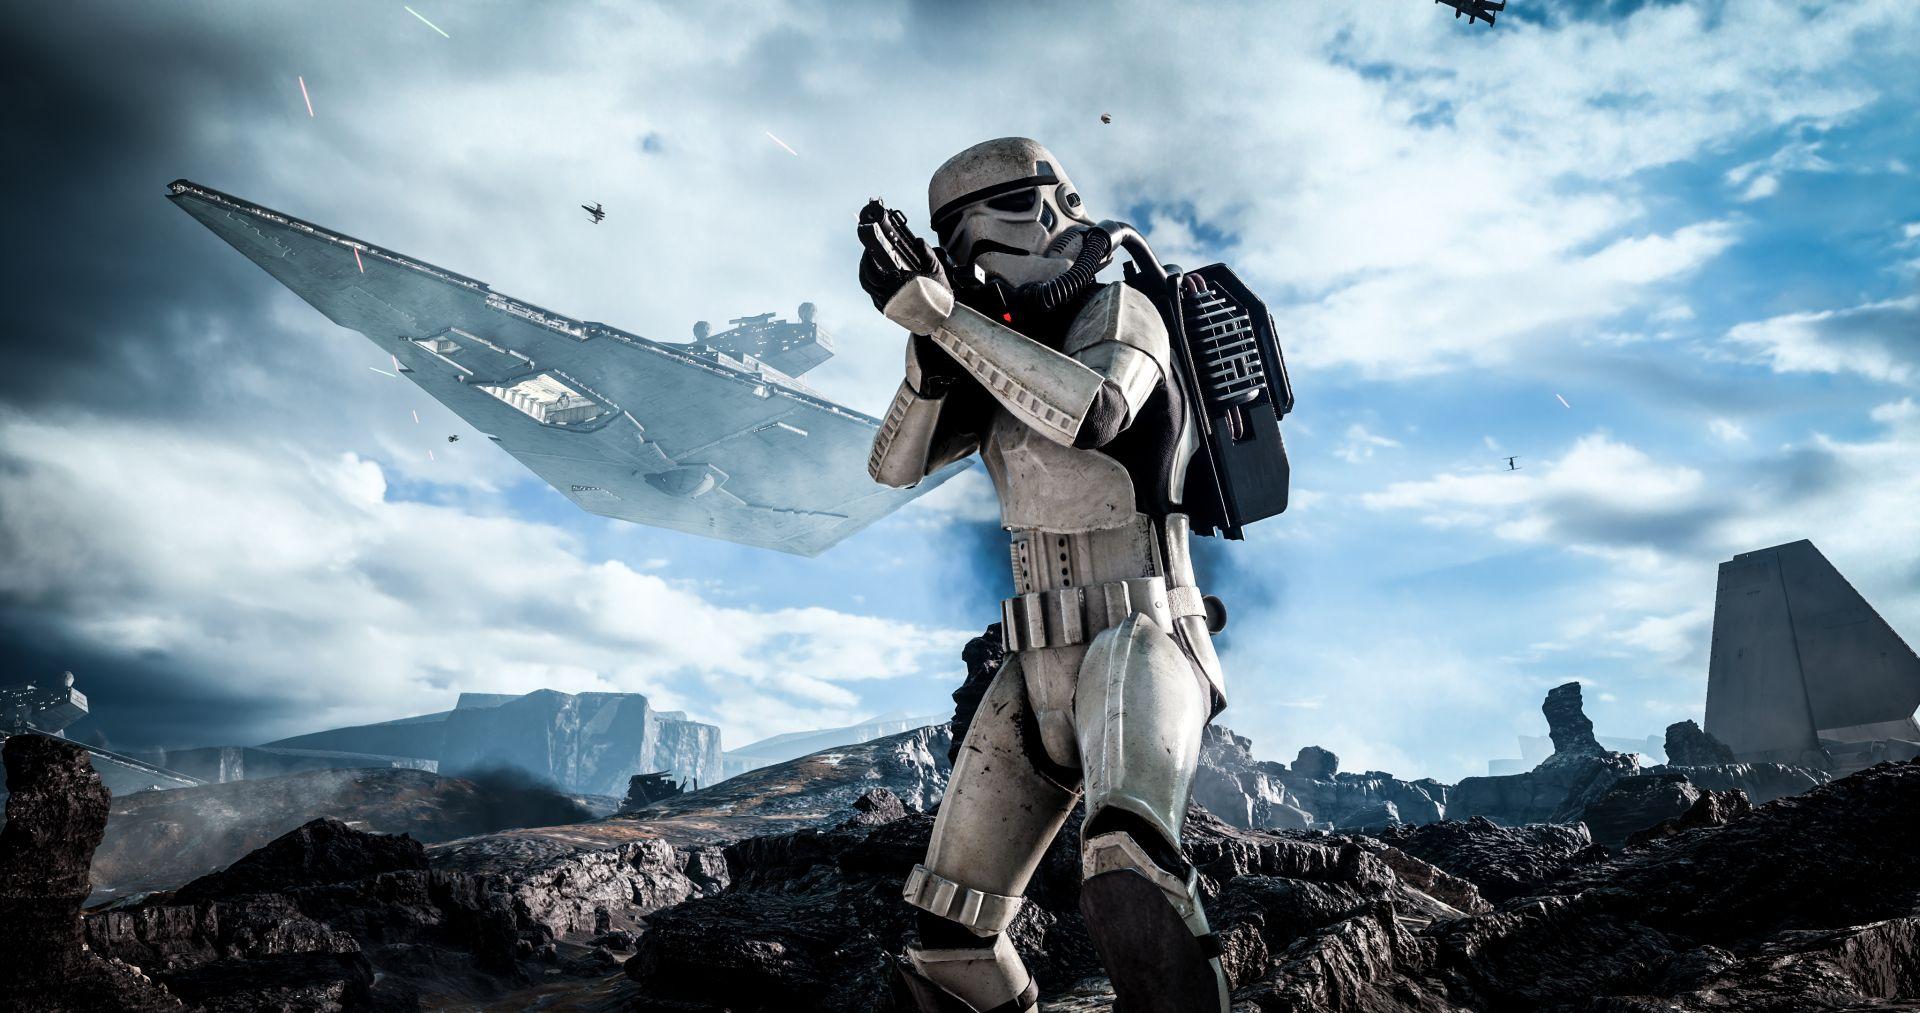 Star Wars Screensaver Background Wallpaper HD